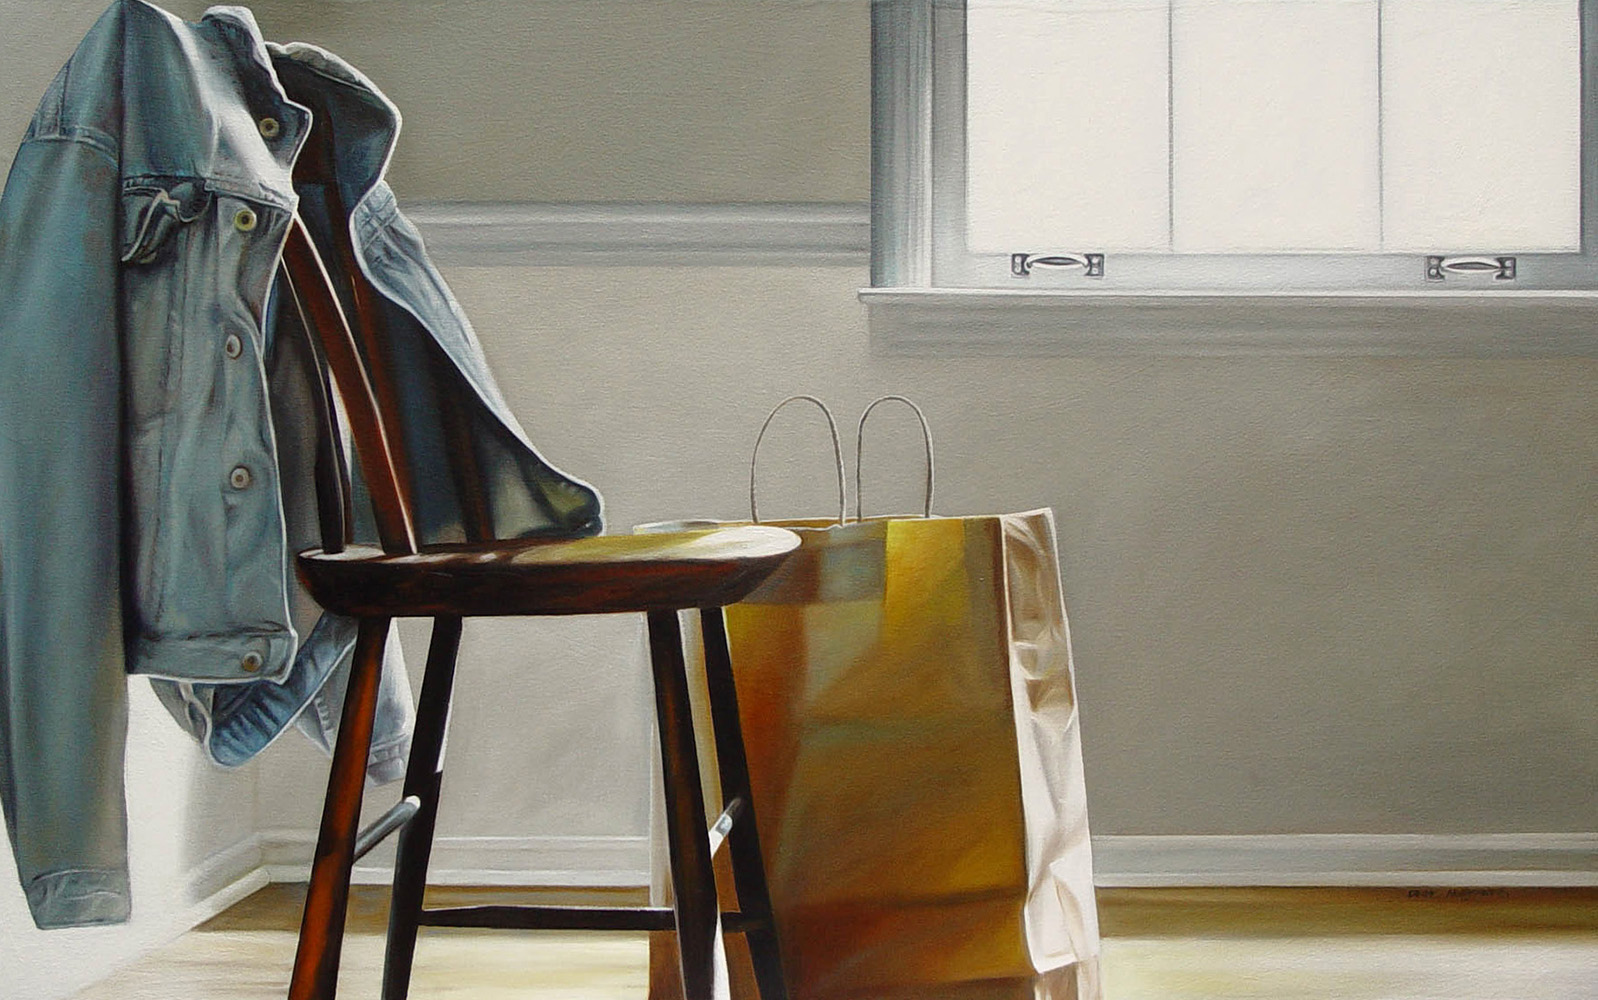 Denim Jacket | 30 x 48 | Oil on canvas